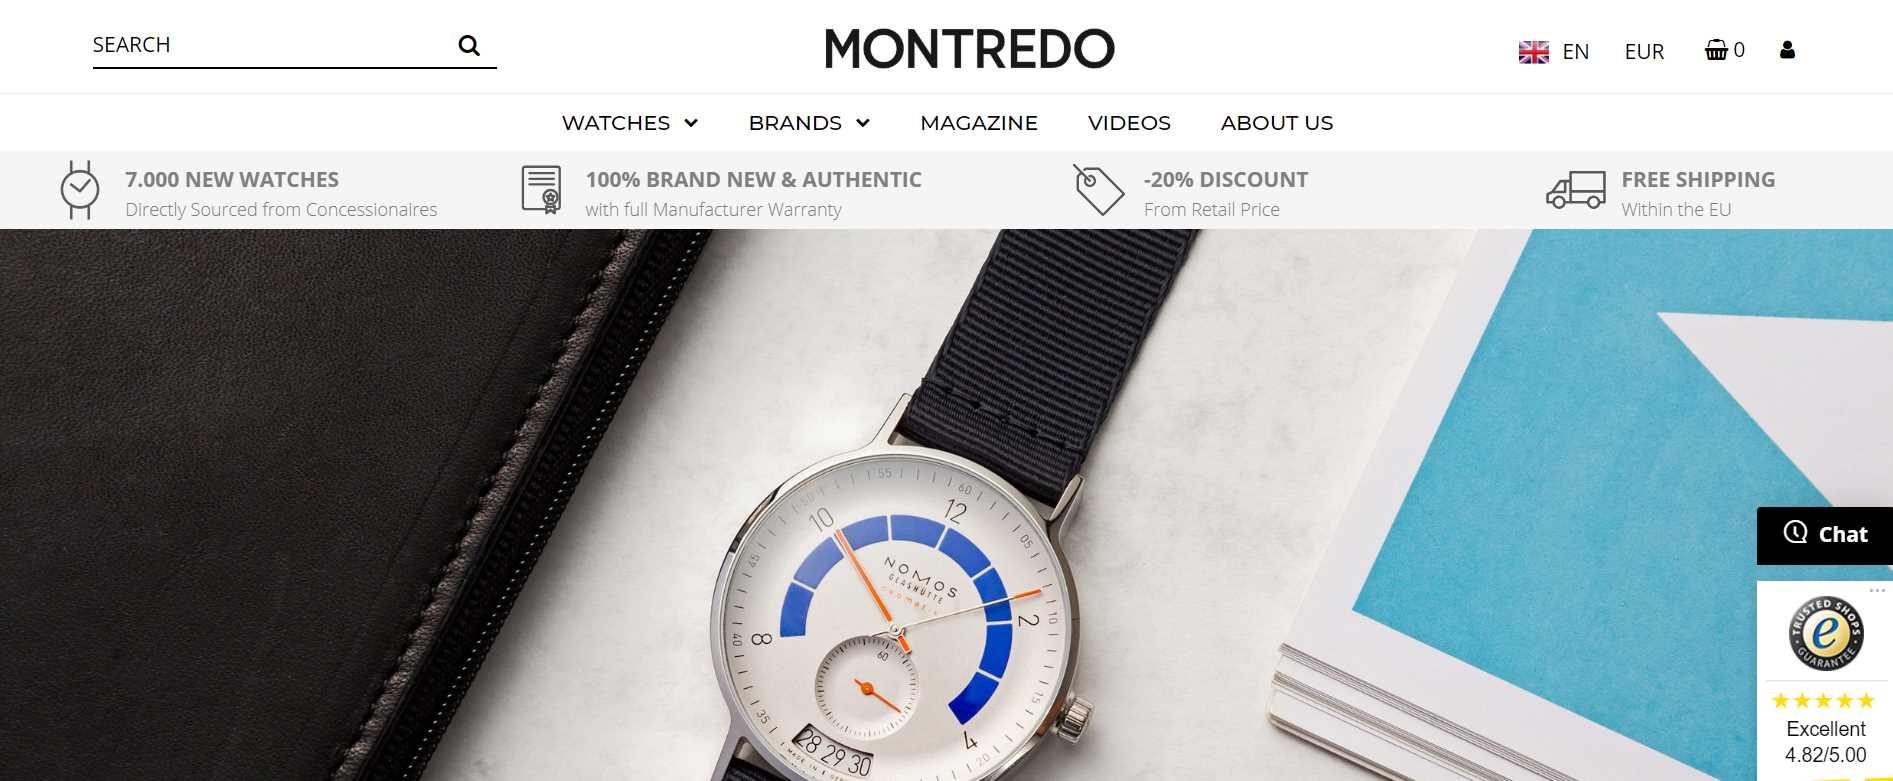 montredo luxury watches online